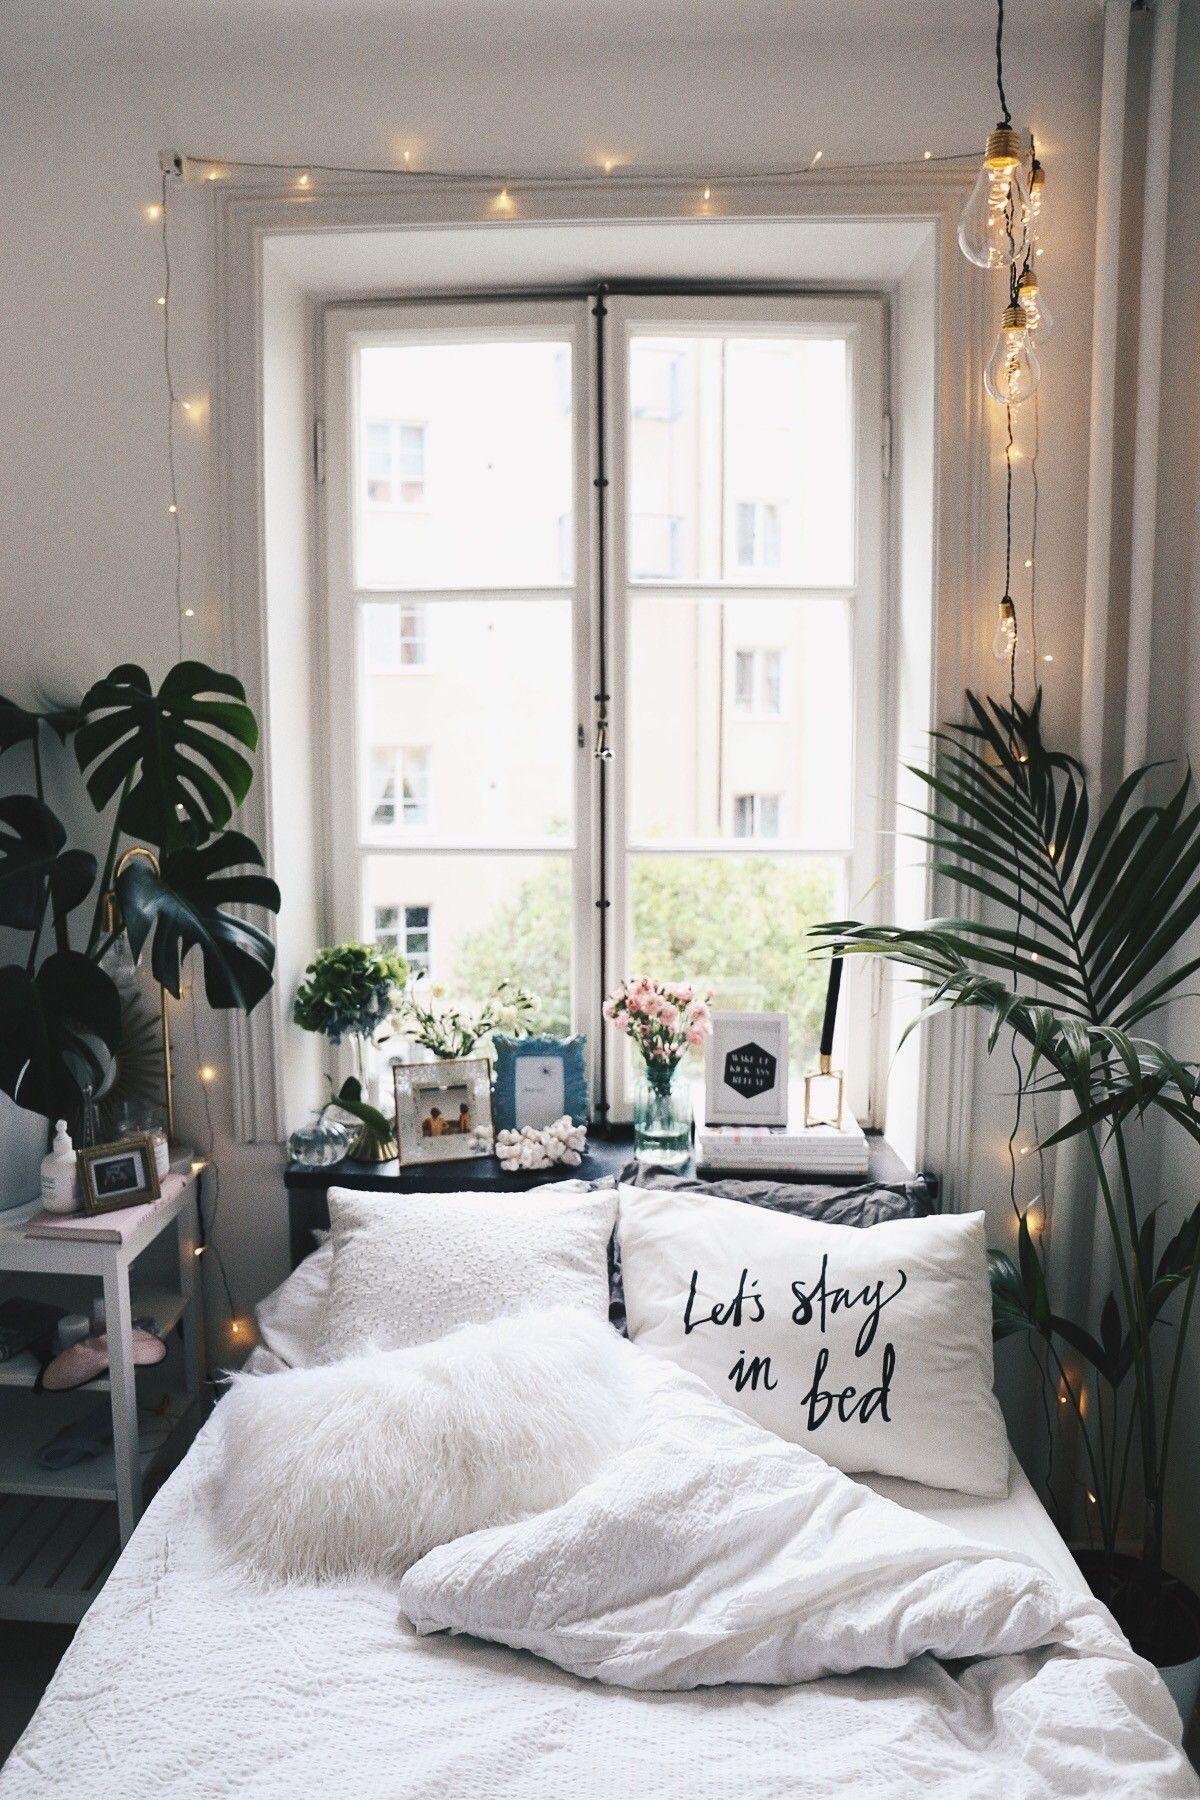 Beau Room Goals